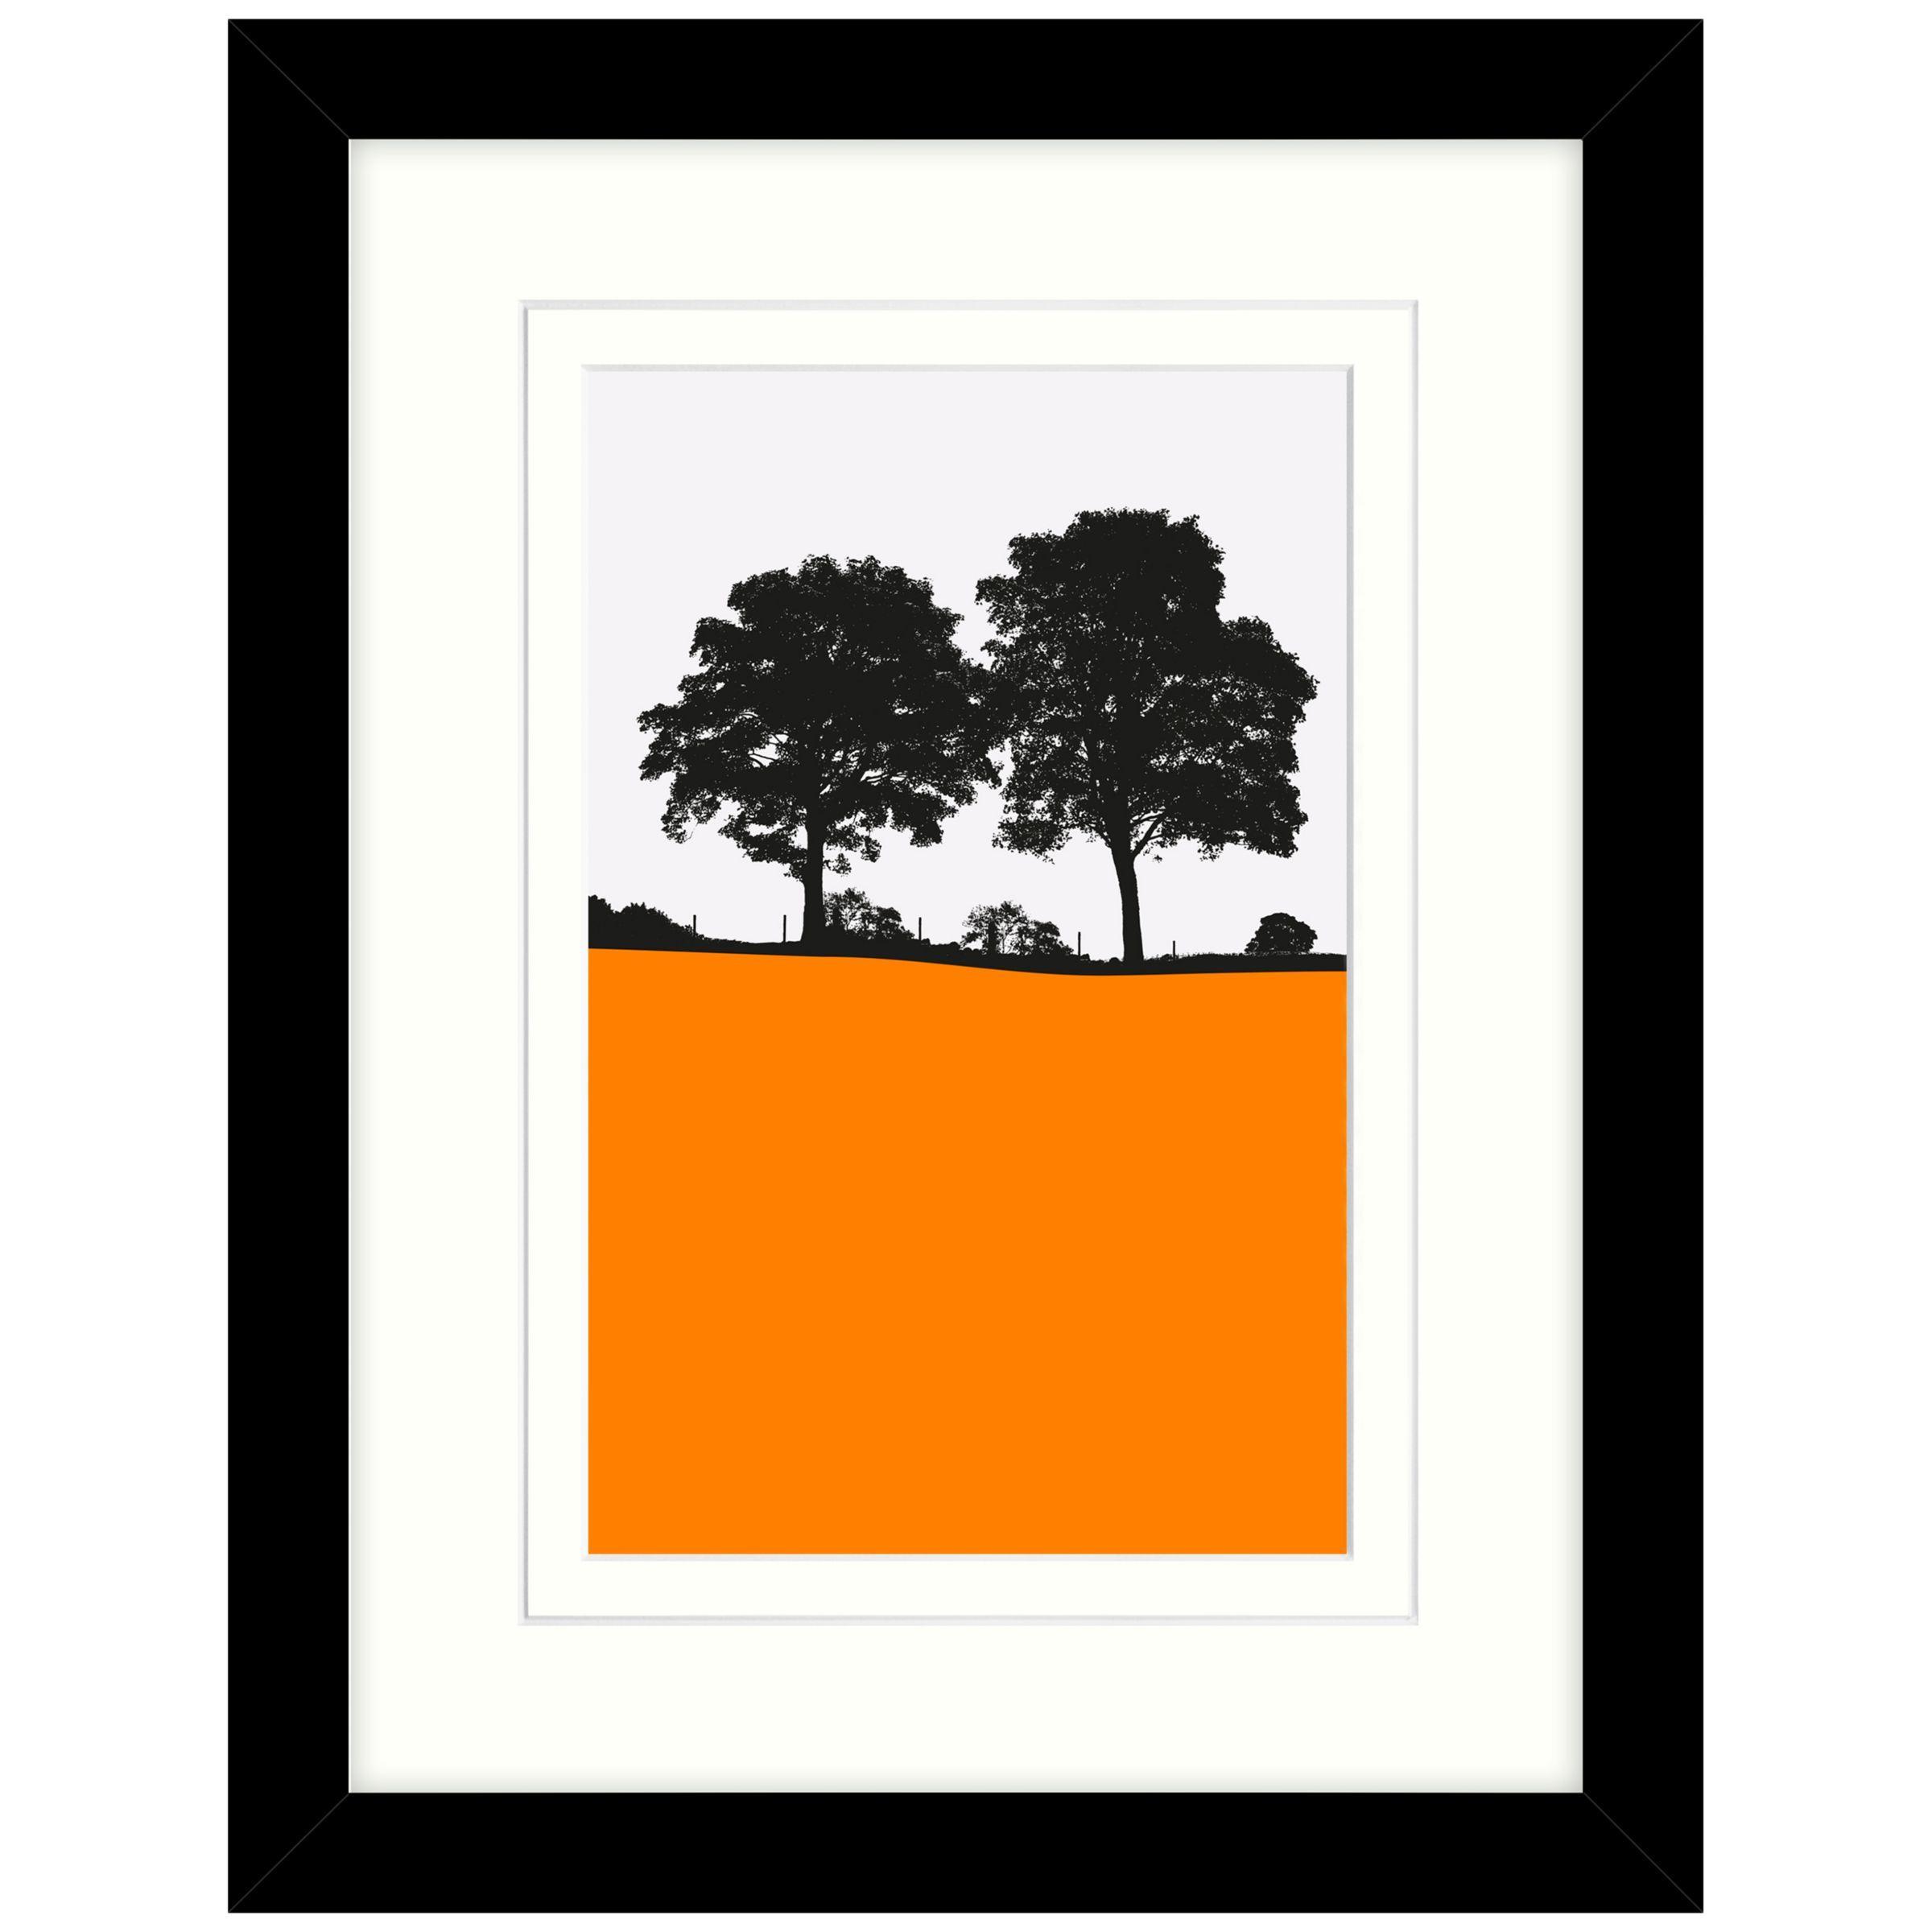 Jacky AlSamarraie Ballo Forest Perth Framed Print, 34 x